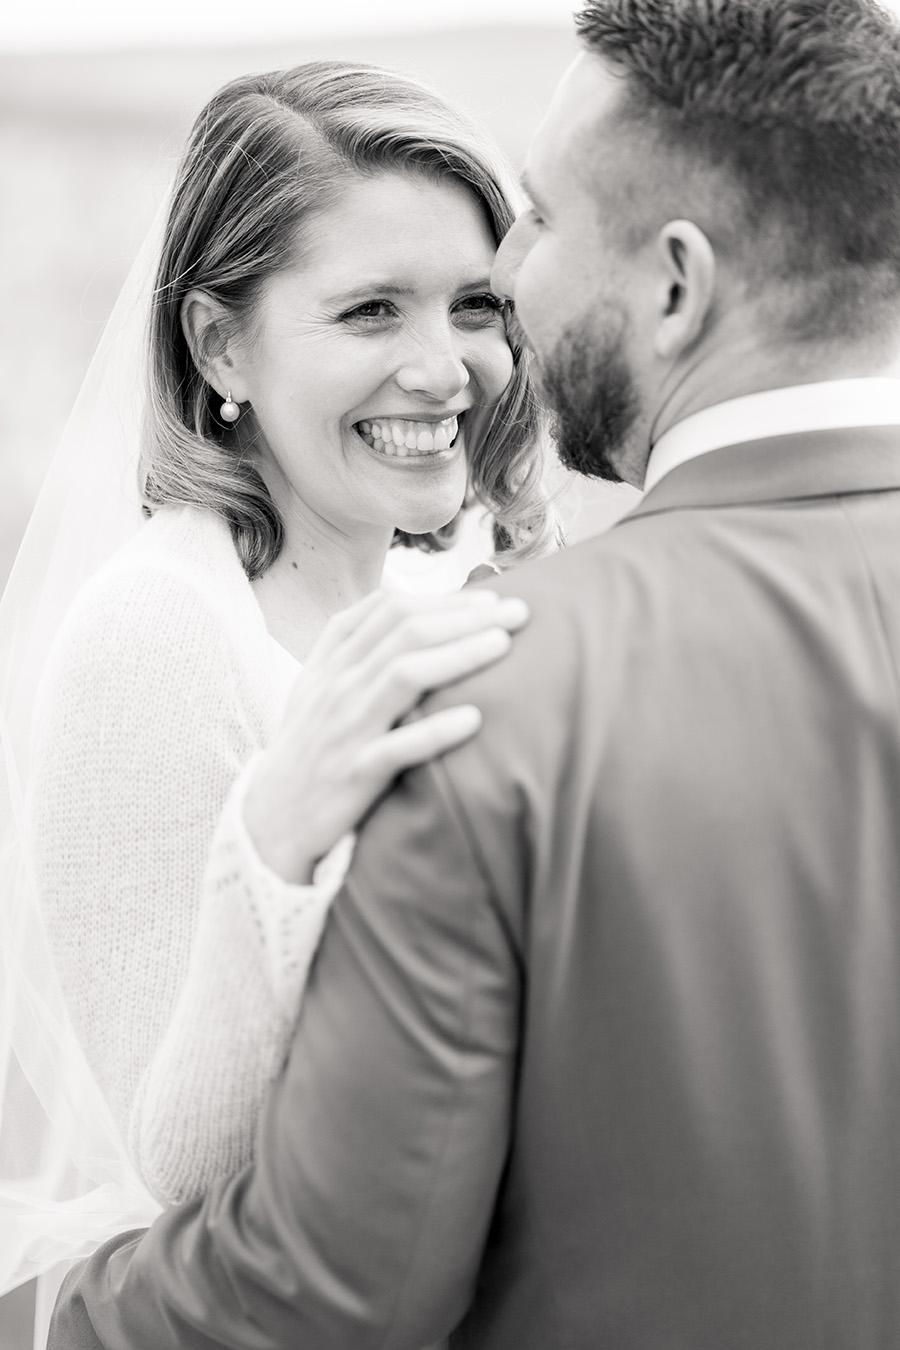 bride smiling at her groom